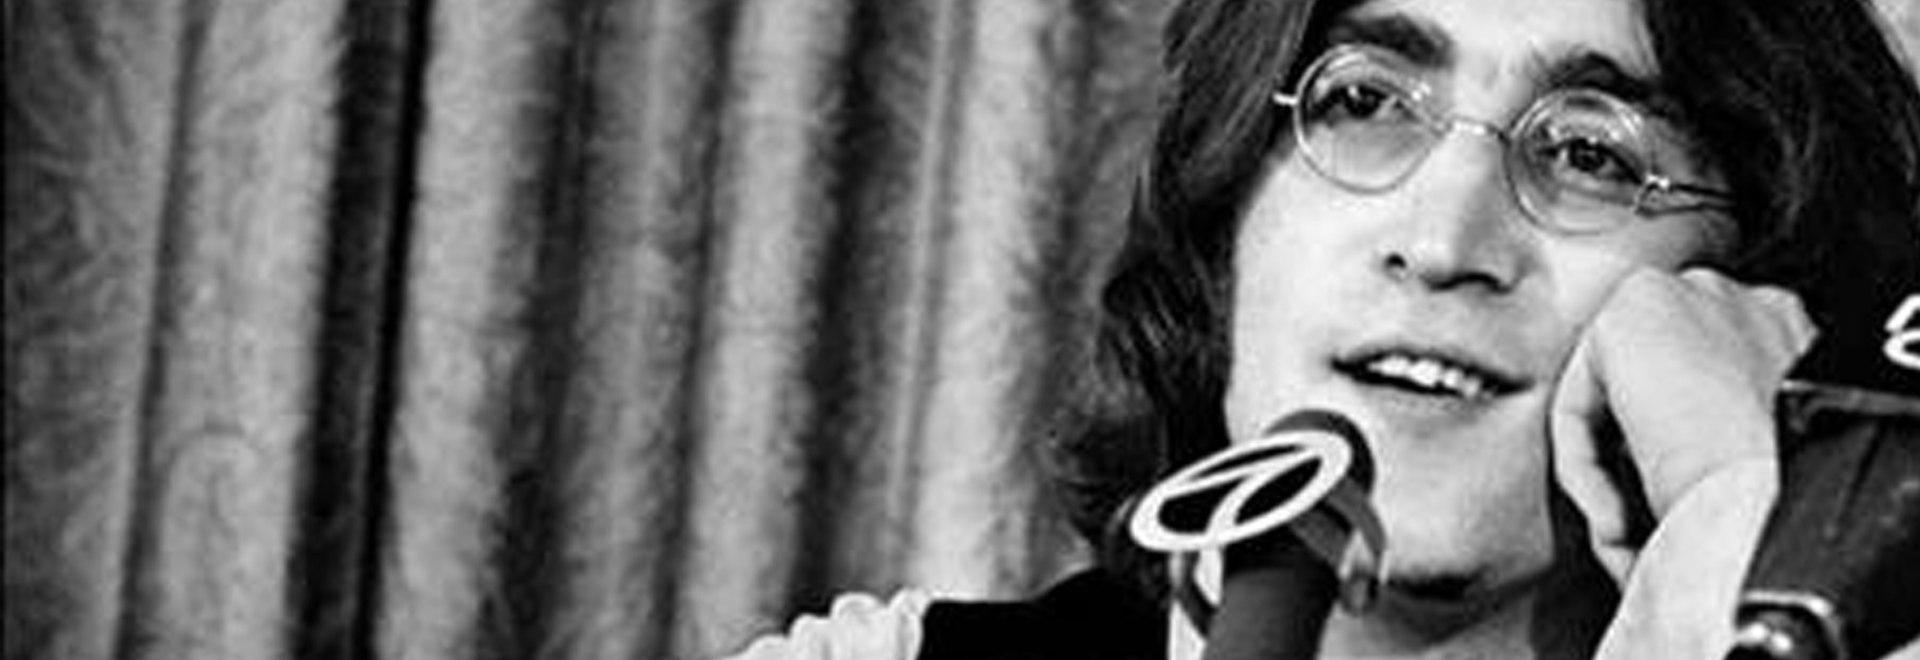 John Lennon - L'ultima intervista